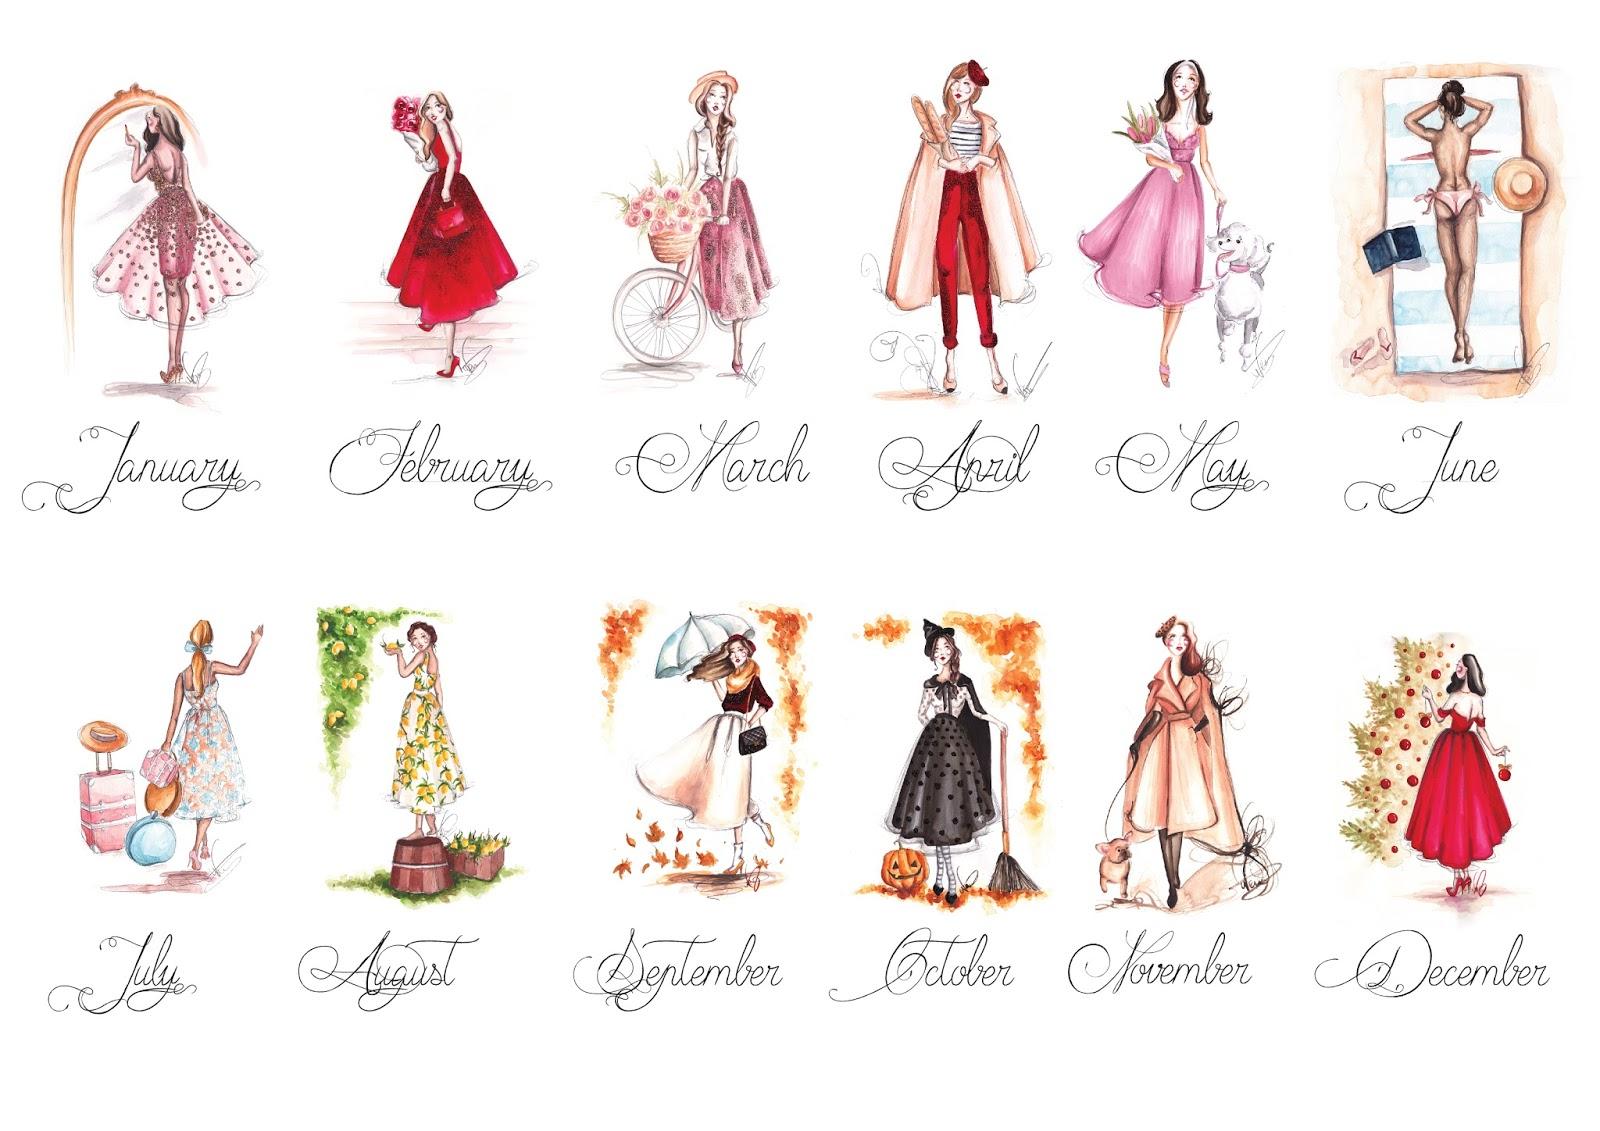 Fashion Illustration Calendar : Current project the fashion calendar dorinus